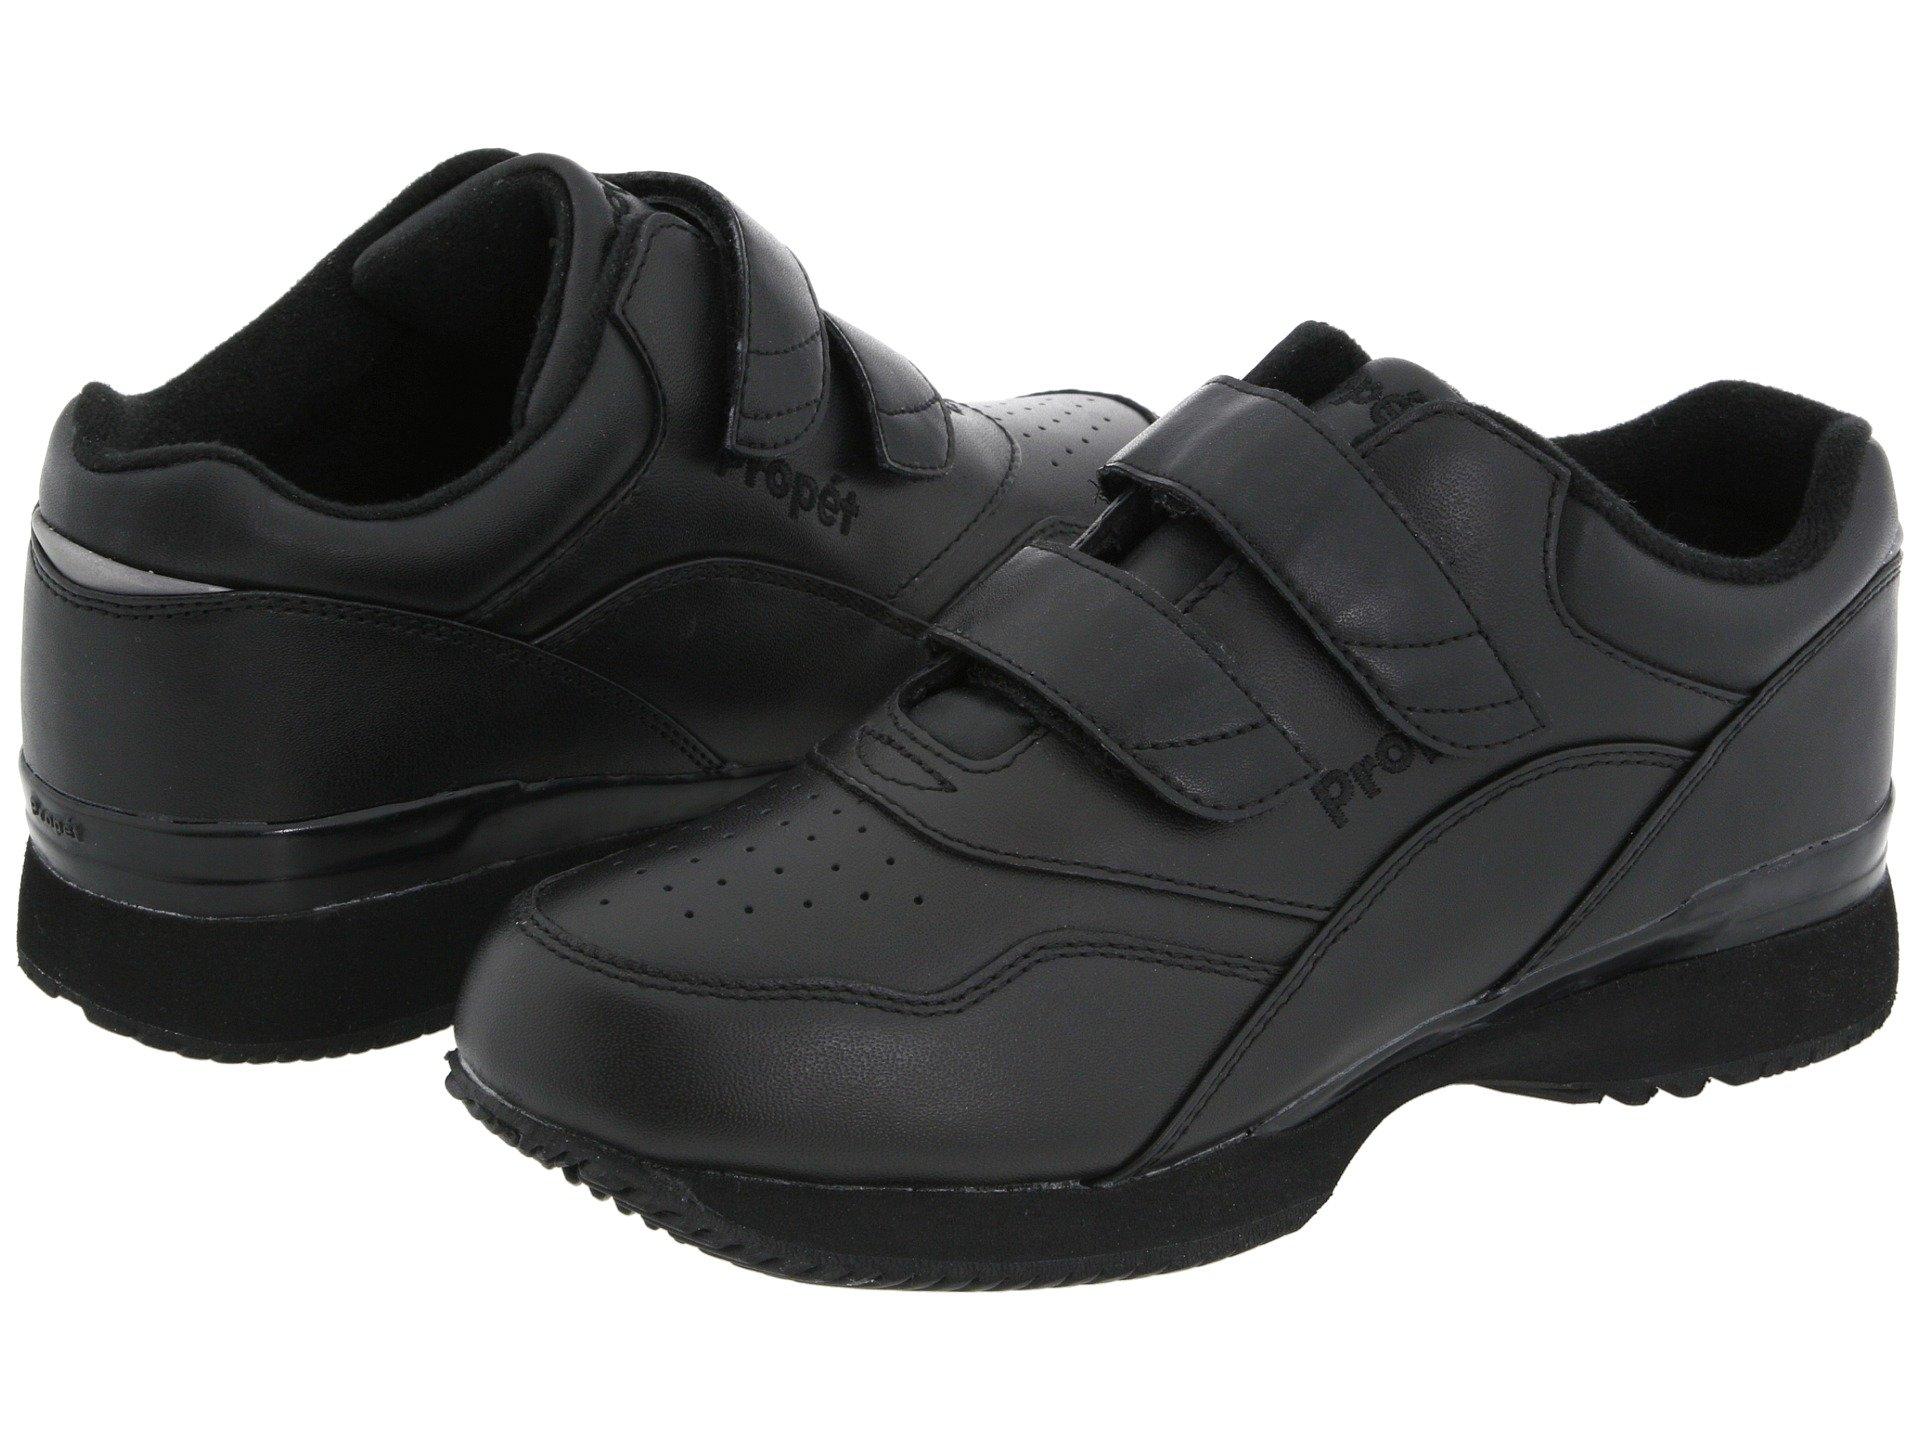 Girls Ortopedic Shoes